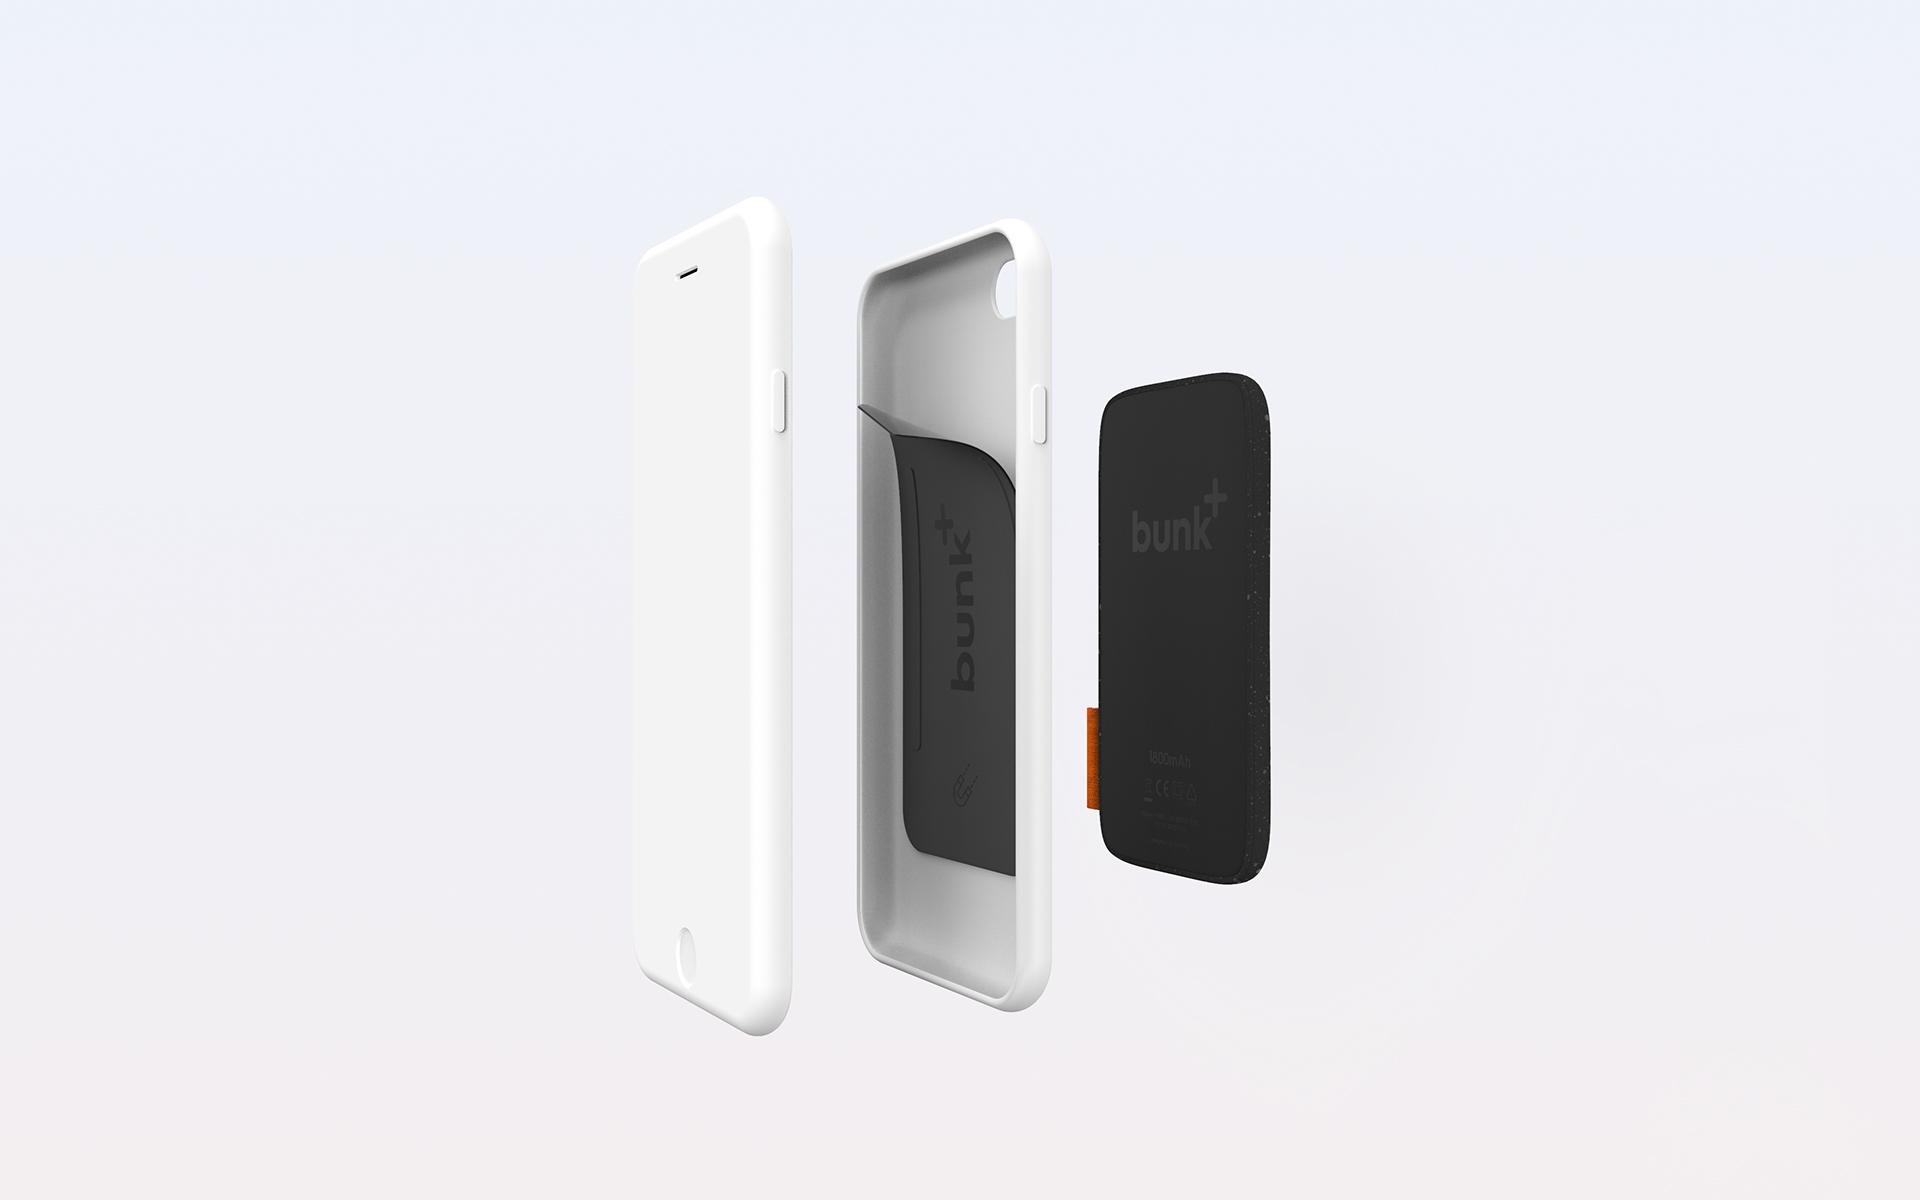 Industrial Design: Bunk - The wireless smartphone battery